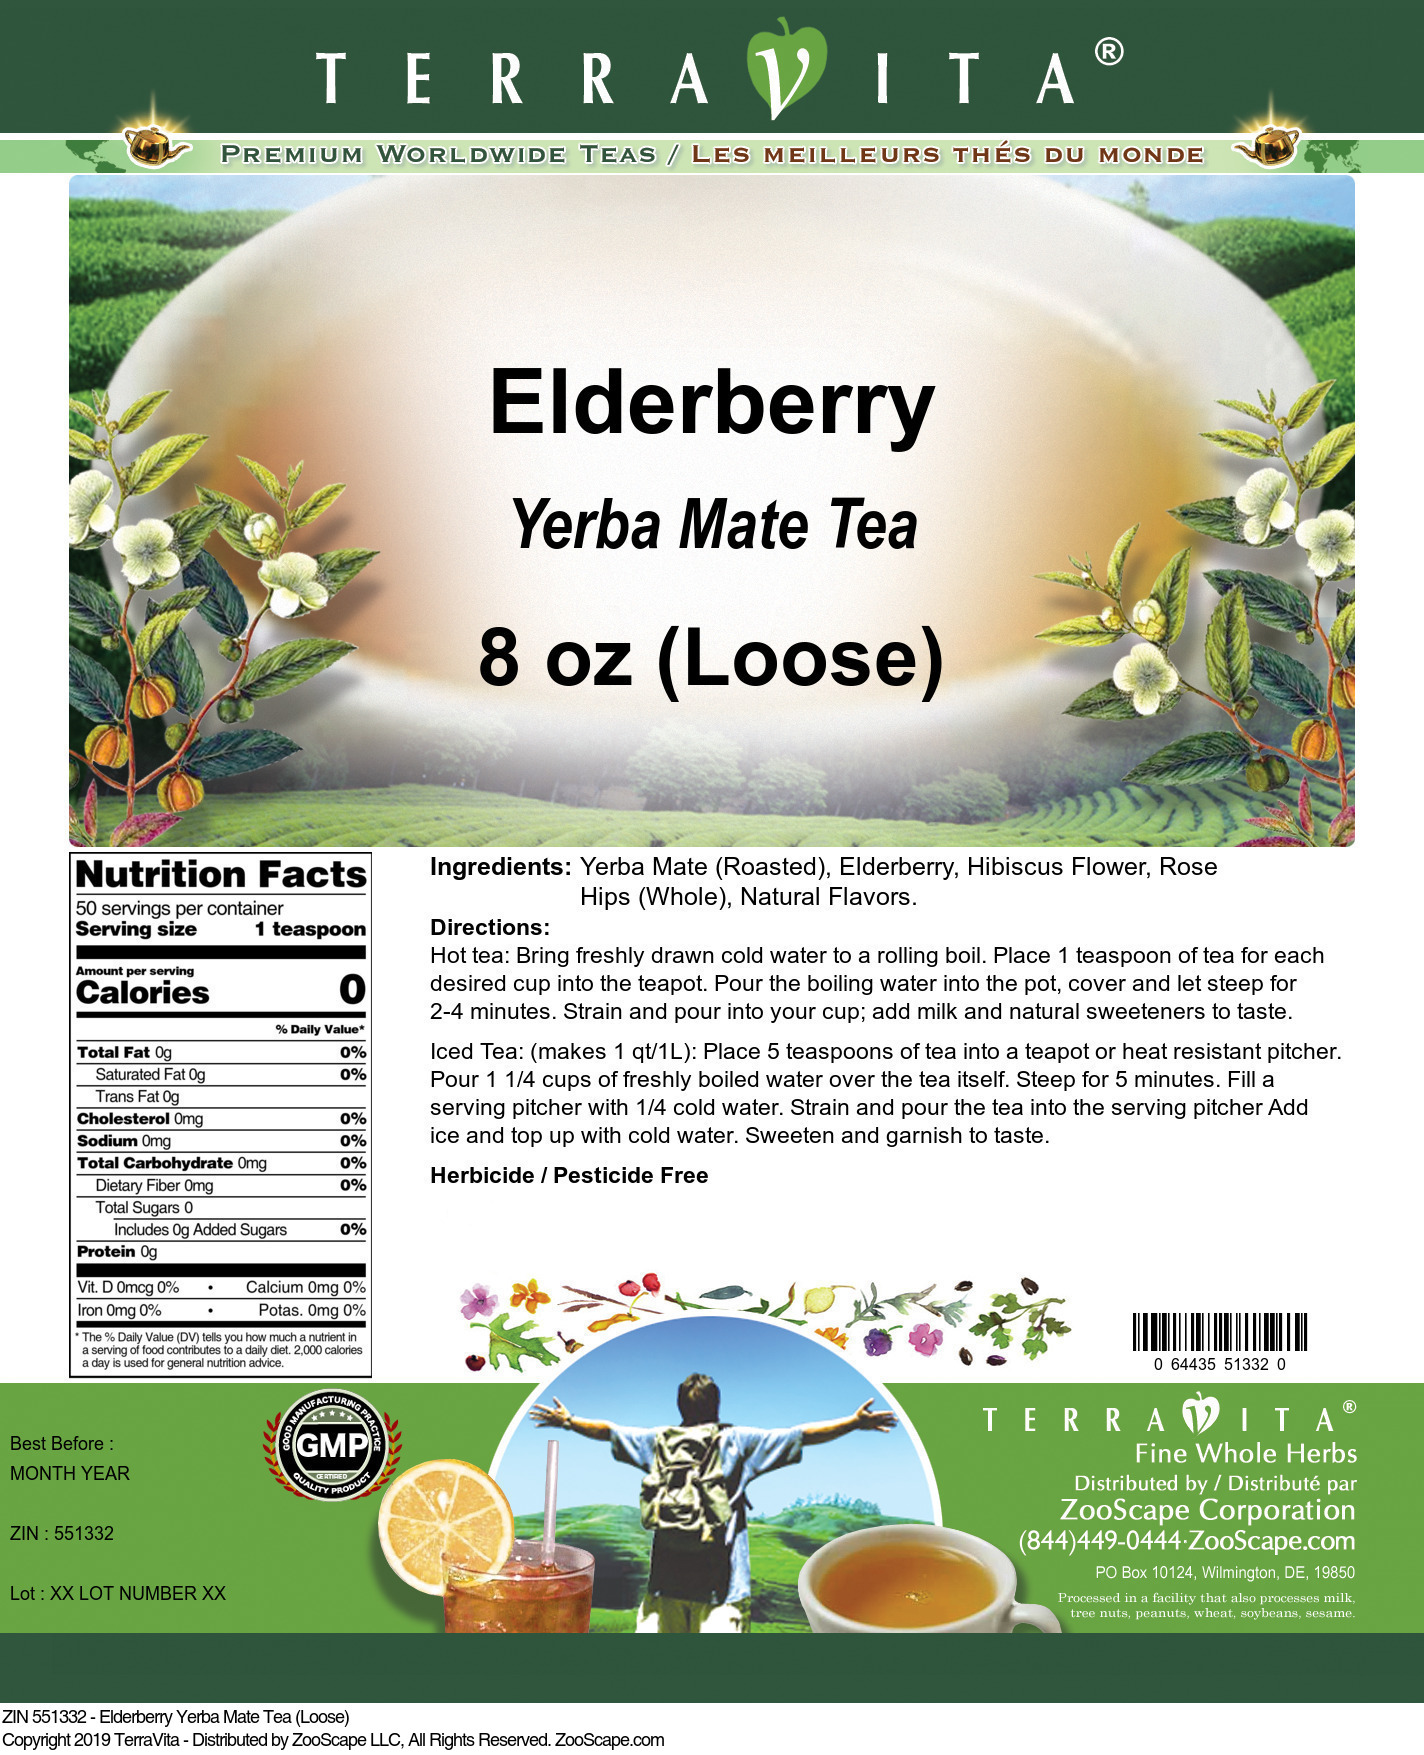 Elderberry Yerba Mate